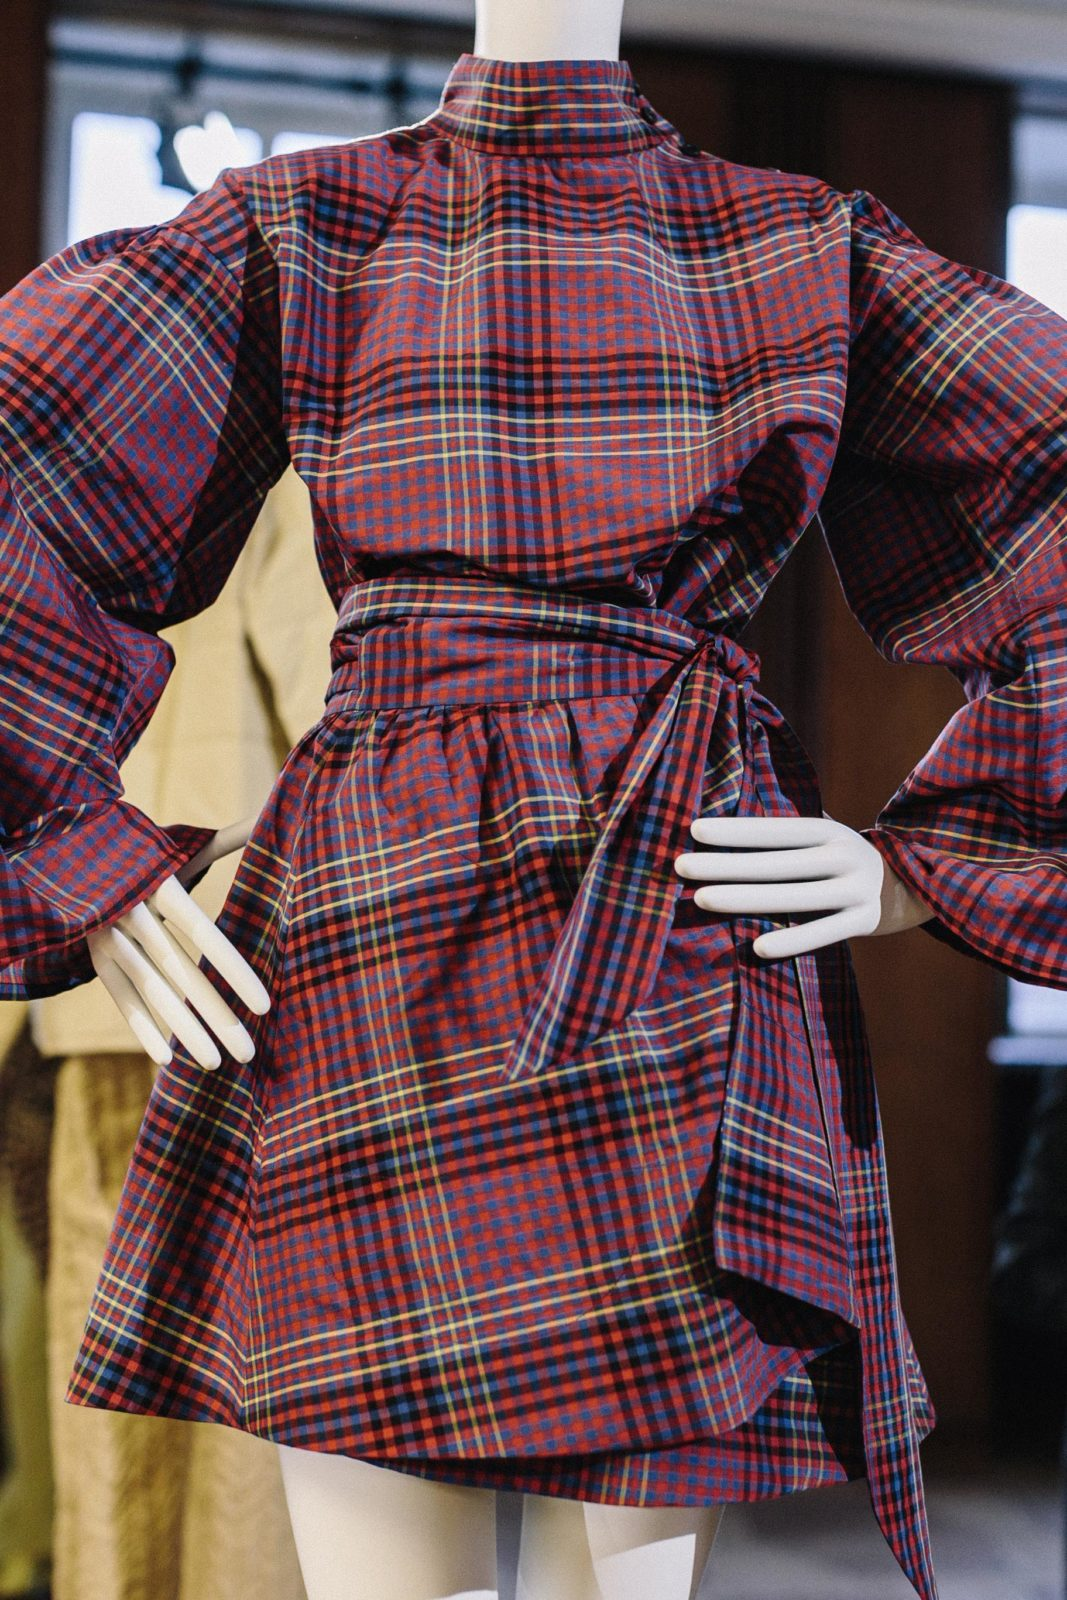 FäHig Escada Abendkleid Seide Orange One Shoulder 36 Kleid Neu Phantasie Farben Damenmode